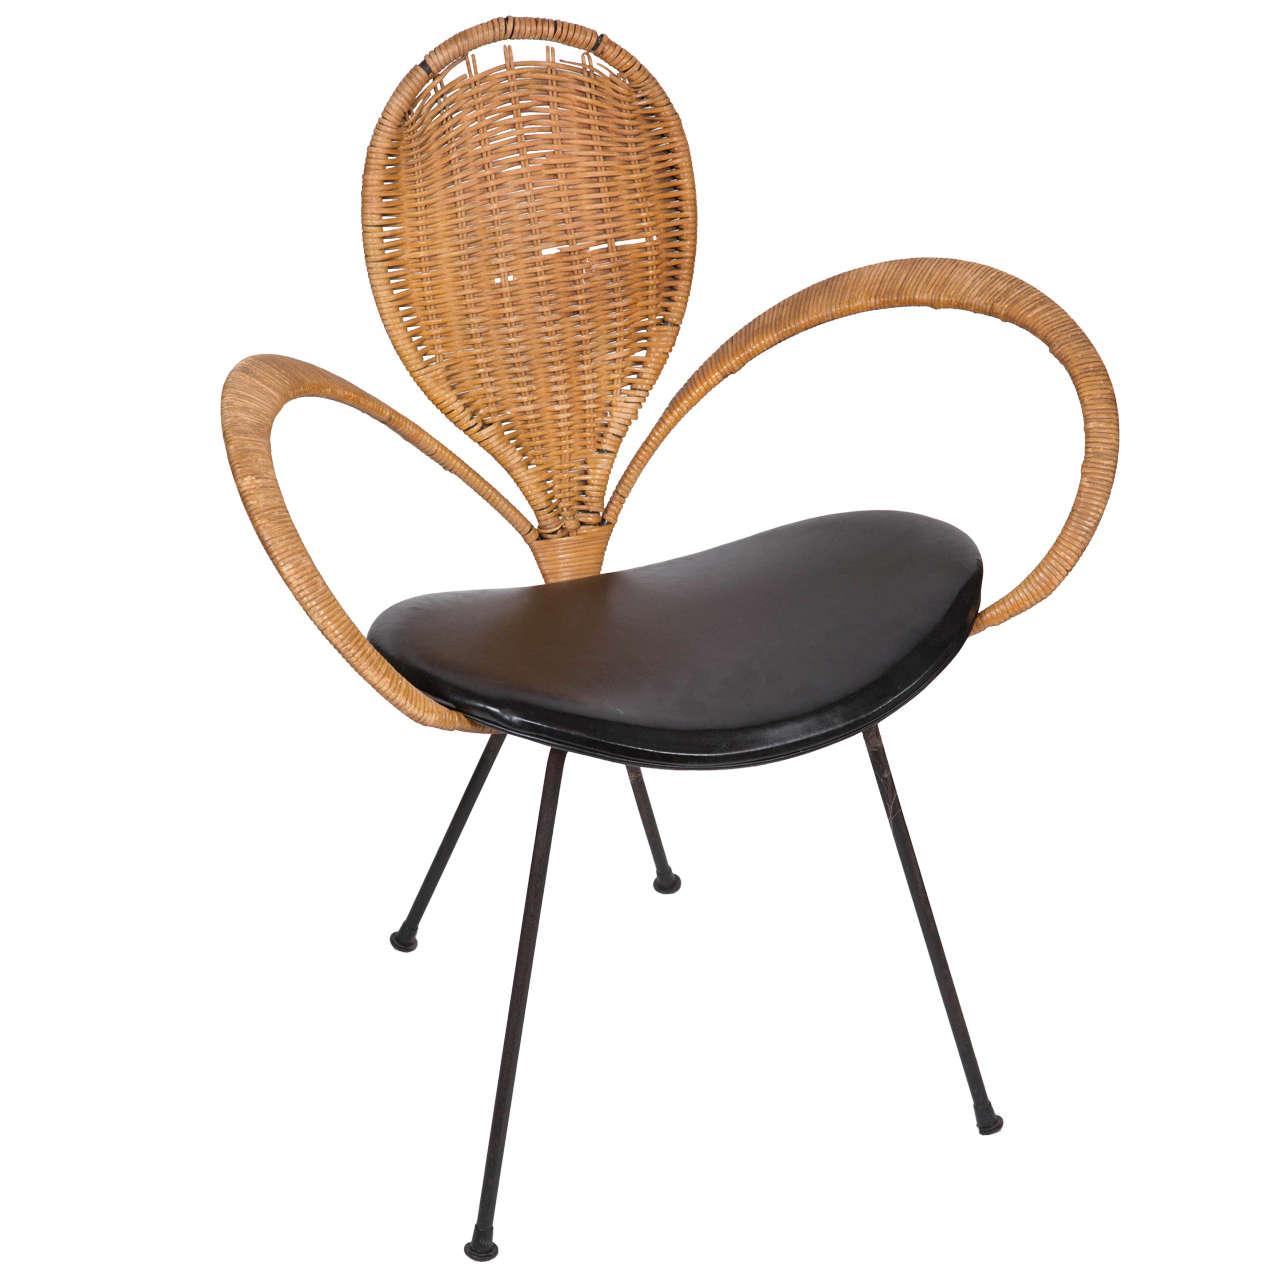 Mid-Century Modern Wicker Backed Chair 1